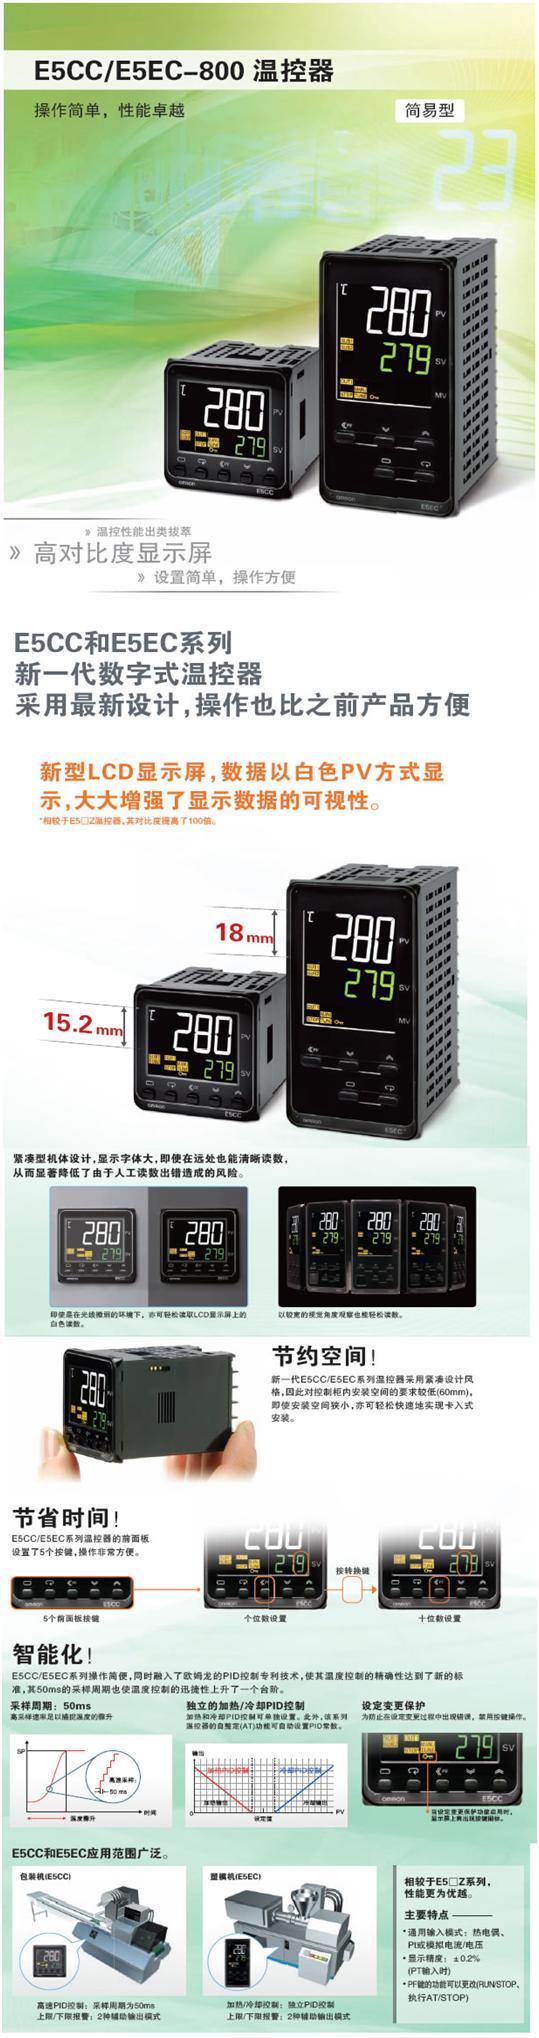 E5CC产品说明.JPG